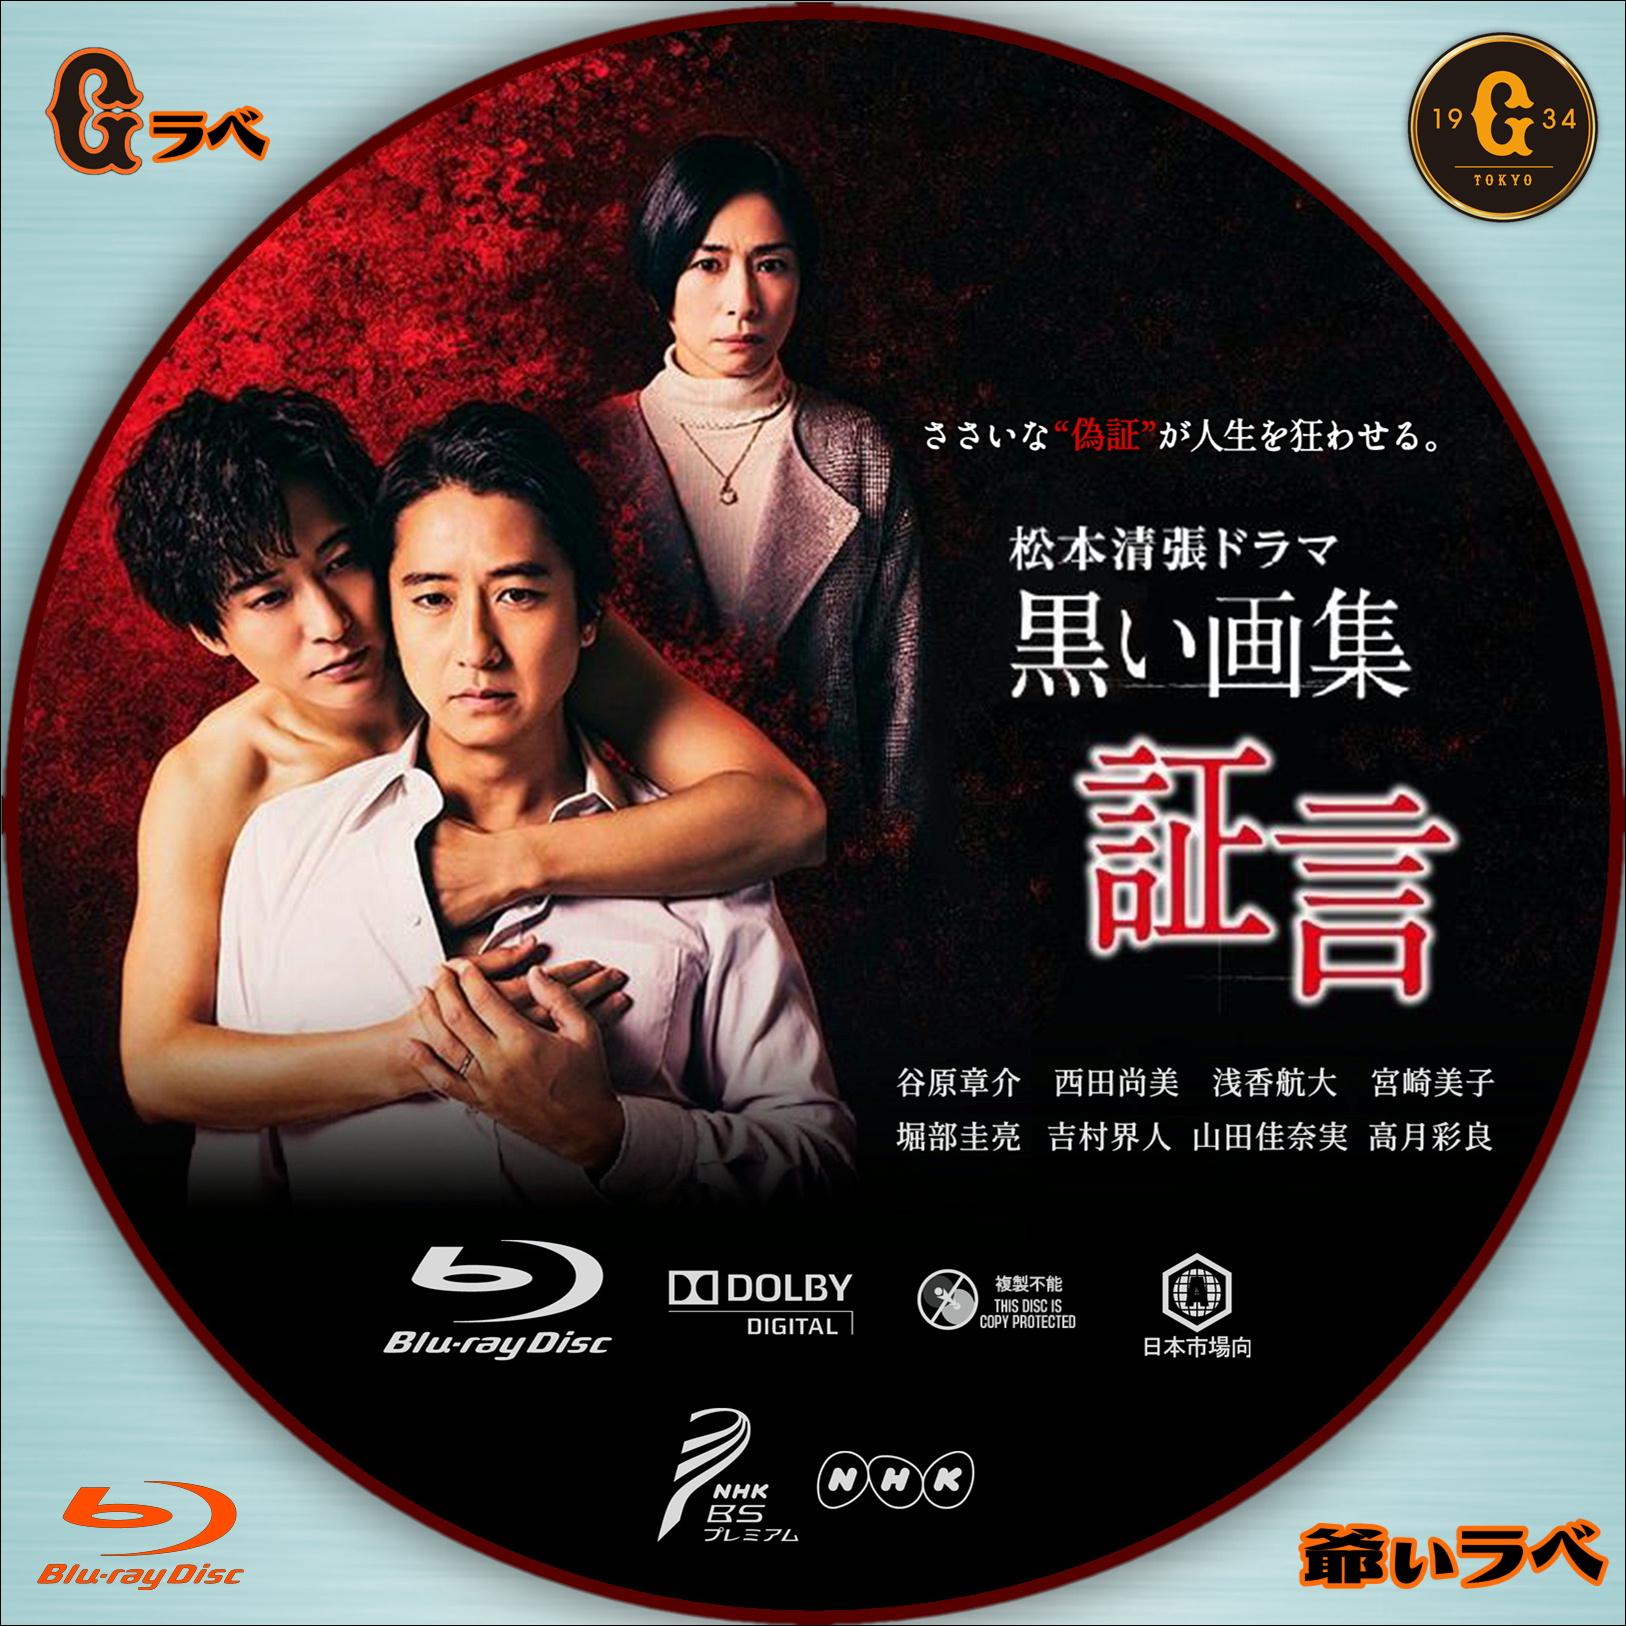 NHK 松本清張ドラマ「黒い画集~証言~」 - 自作 BD・DVDラベルの「爺 ...